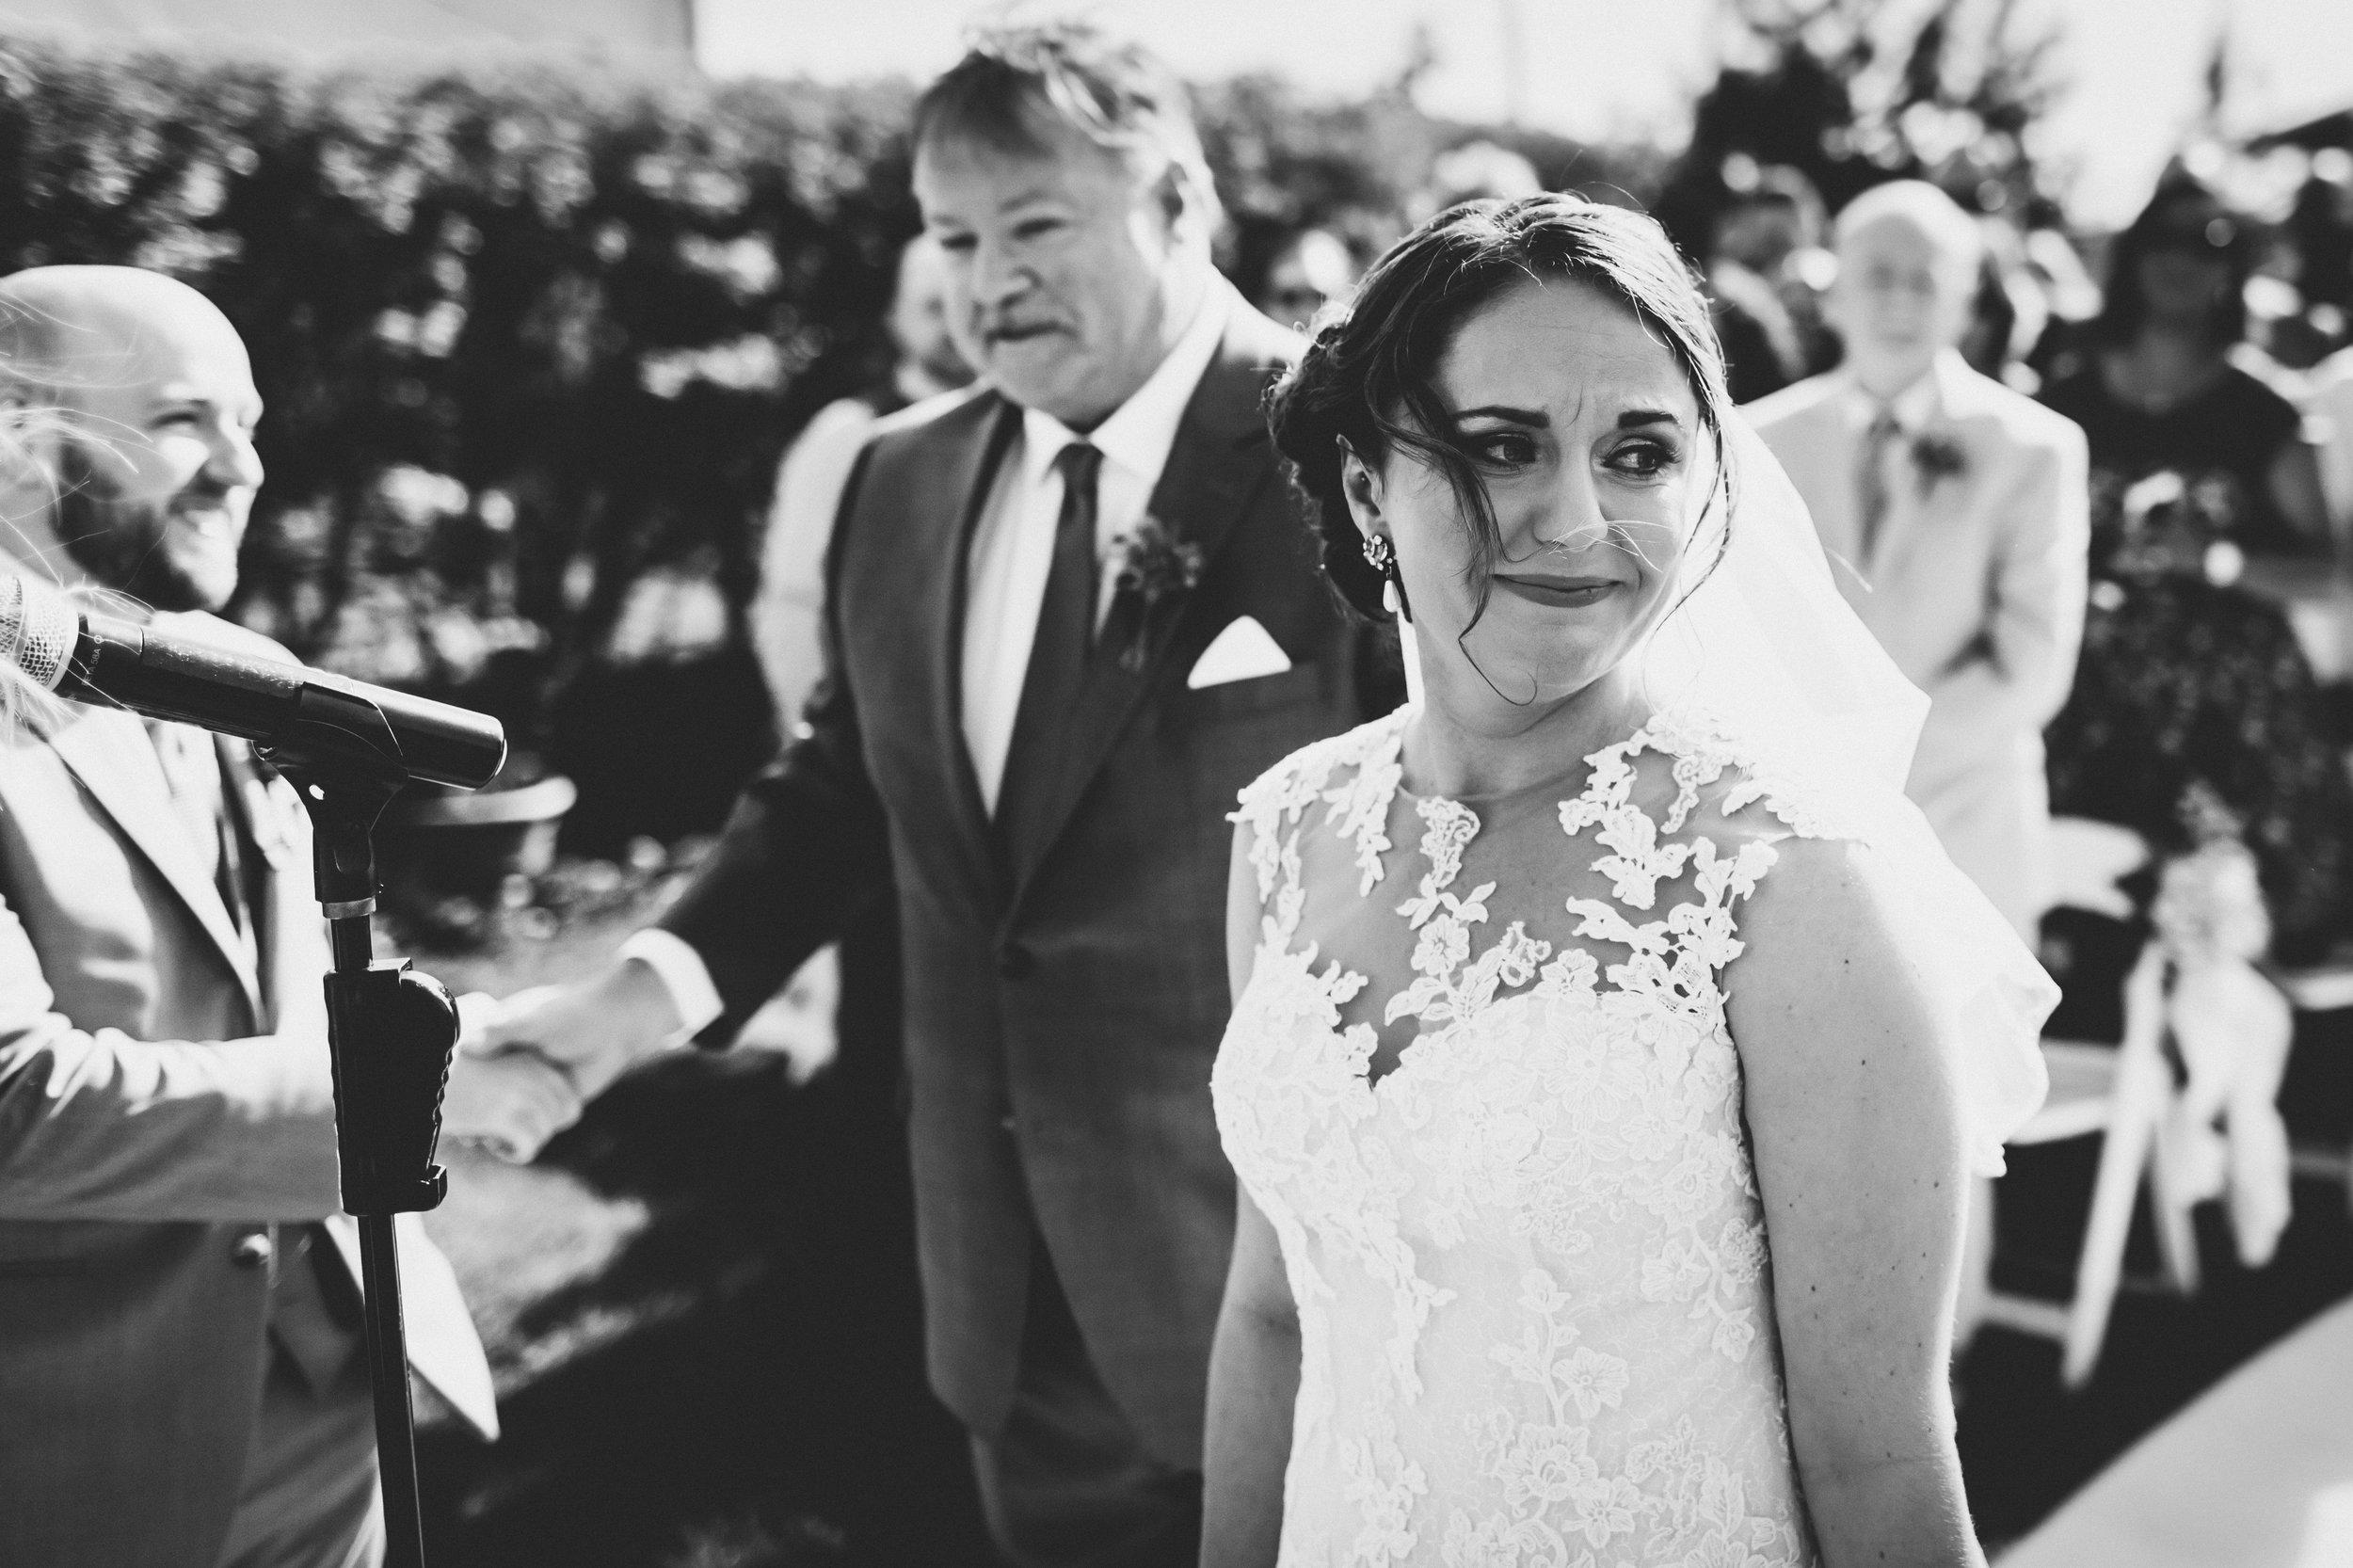 New-York-Documentary-Wedding-Photography-Best-Of-2017-by-Elvira-Kalviste-Photography-134.jpg